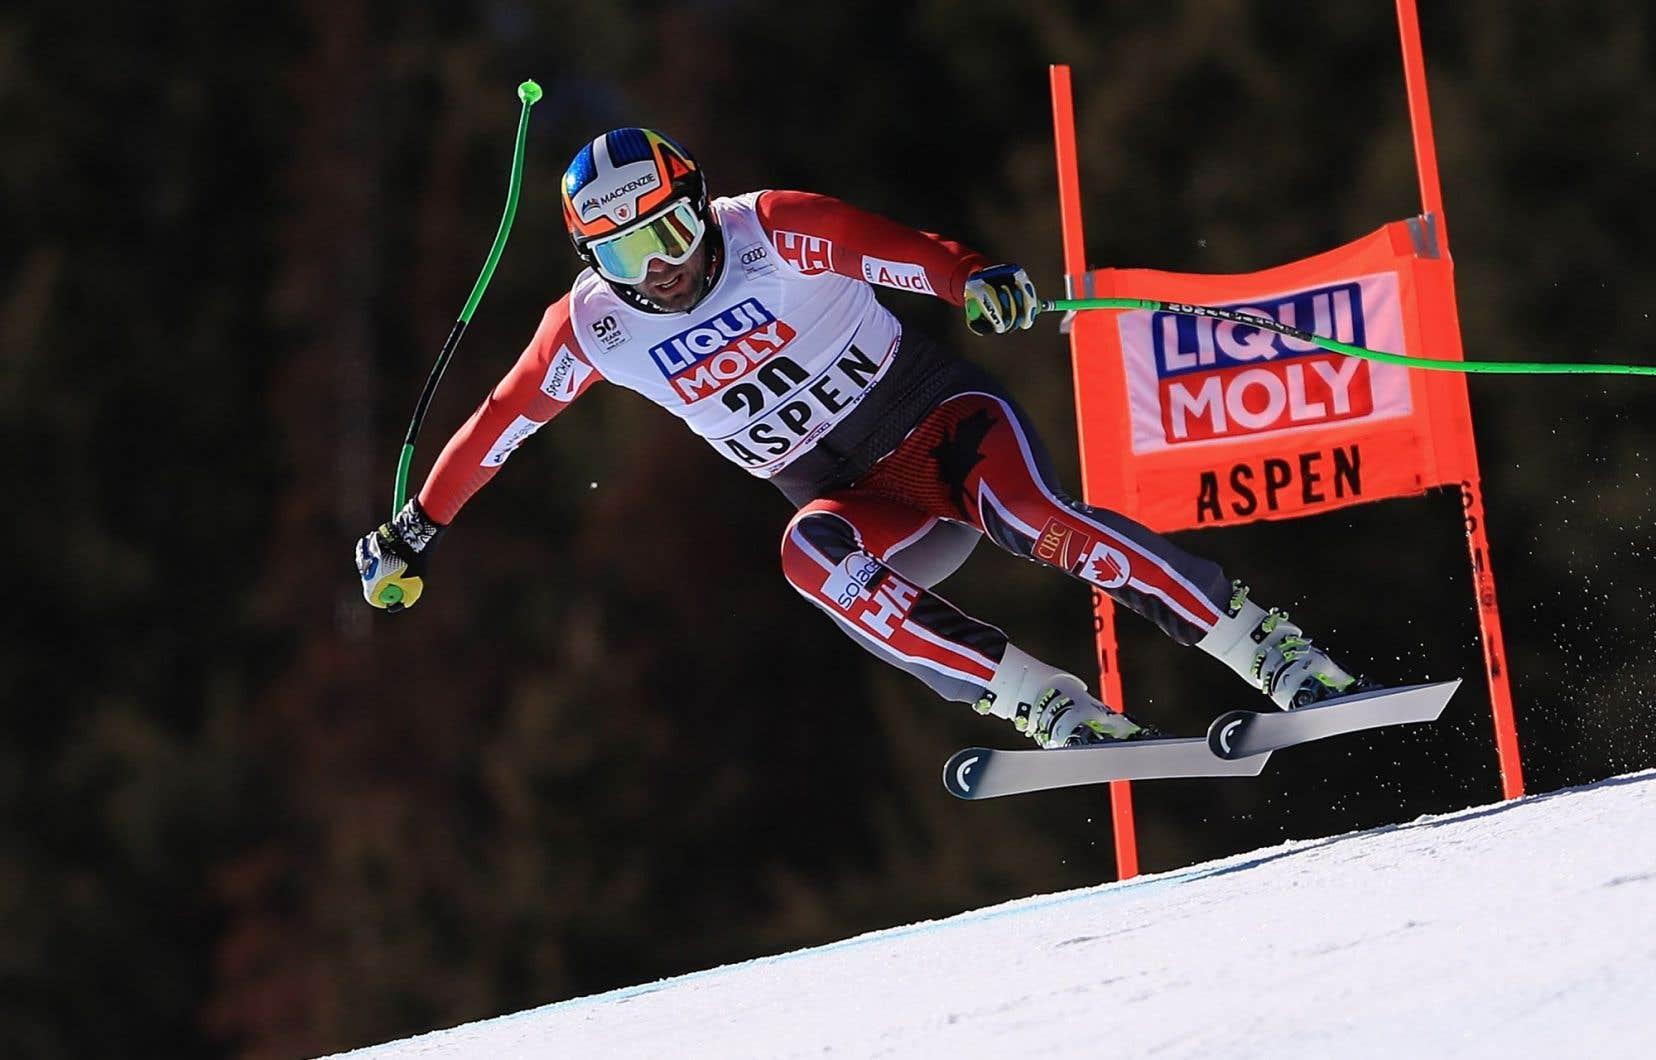 Le skieur canadienManuel Osborne-Paradis